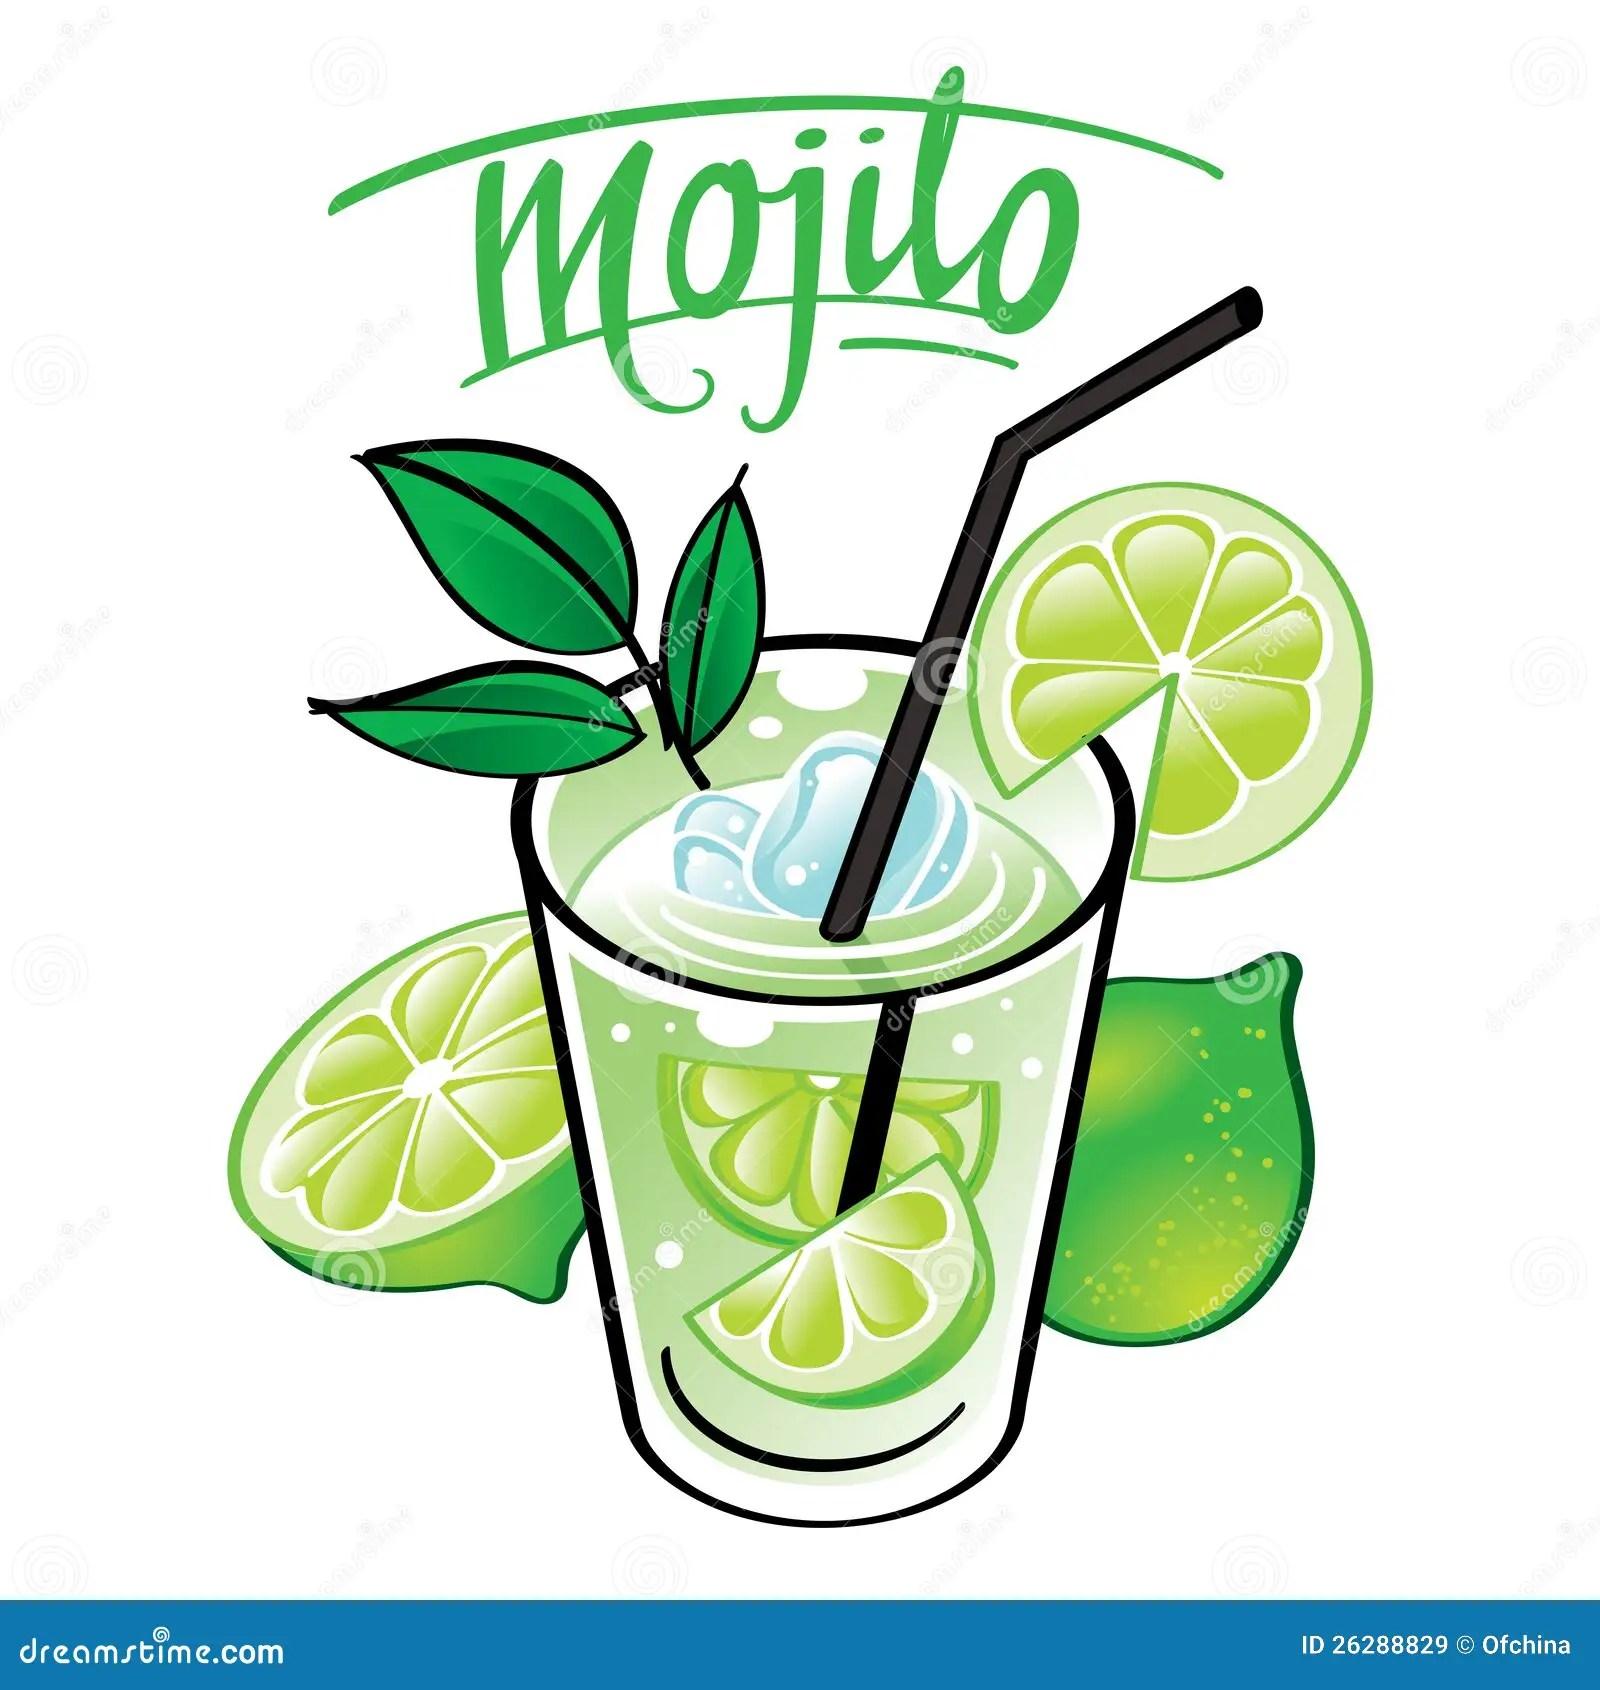 Mojito Royalty Free Stock Images Image 26288829